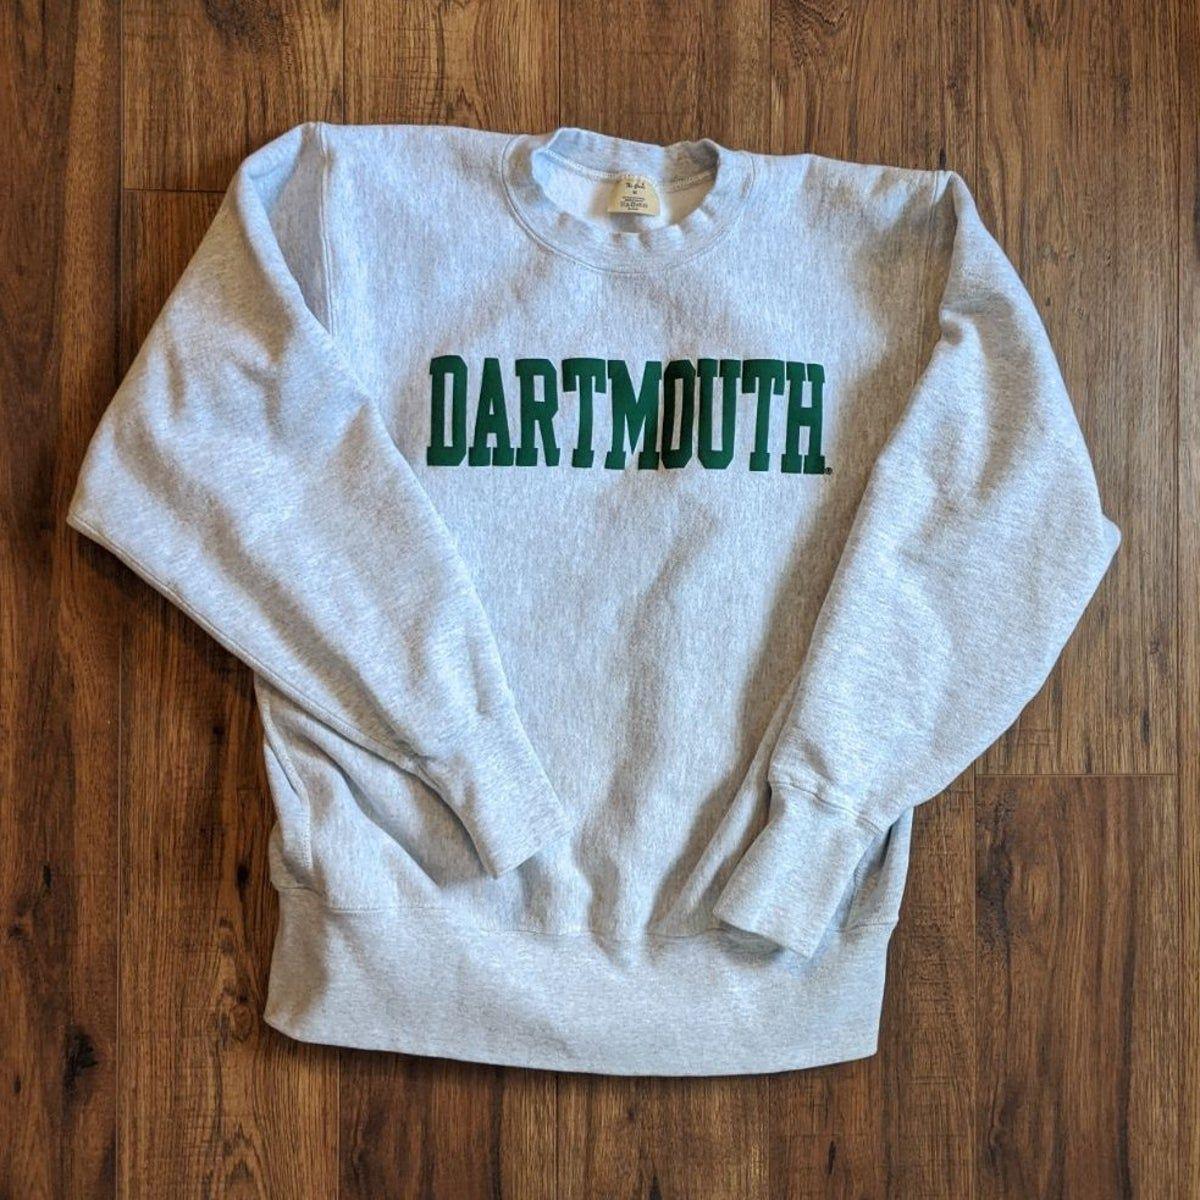 Vintage Dartmouth Crewneck Sweatshirt Sweatshirts Crew Neck Sweatshirt Clothes [ 1200 x 1200 Pixel ]